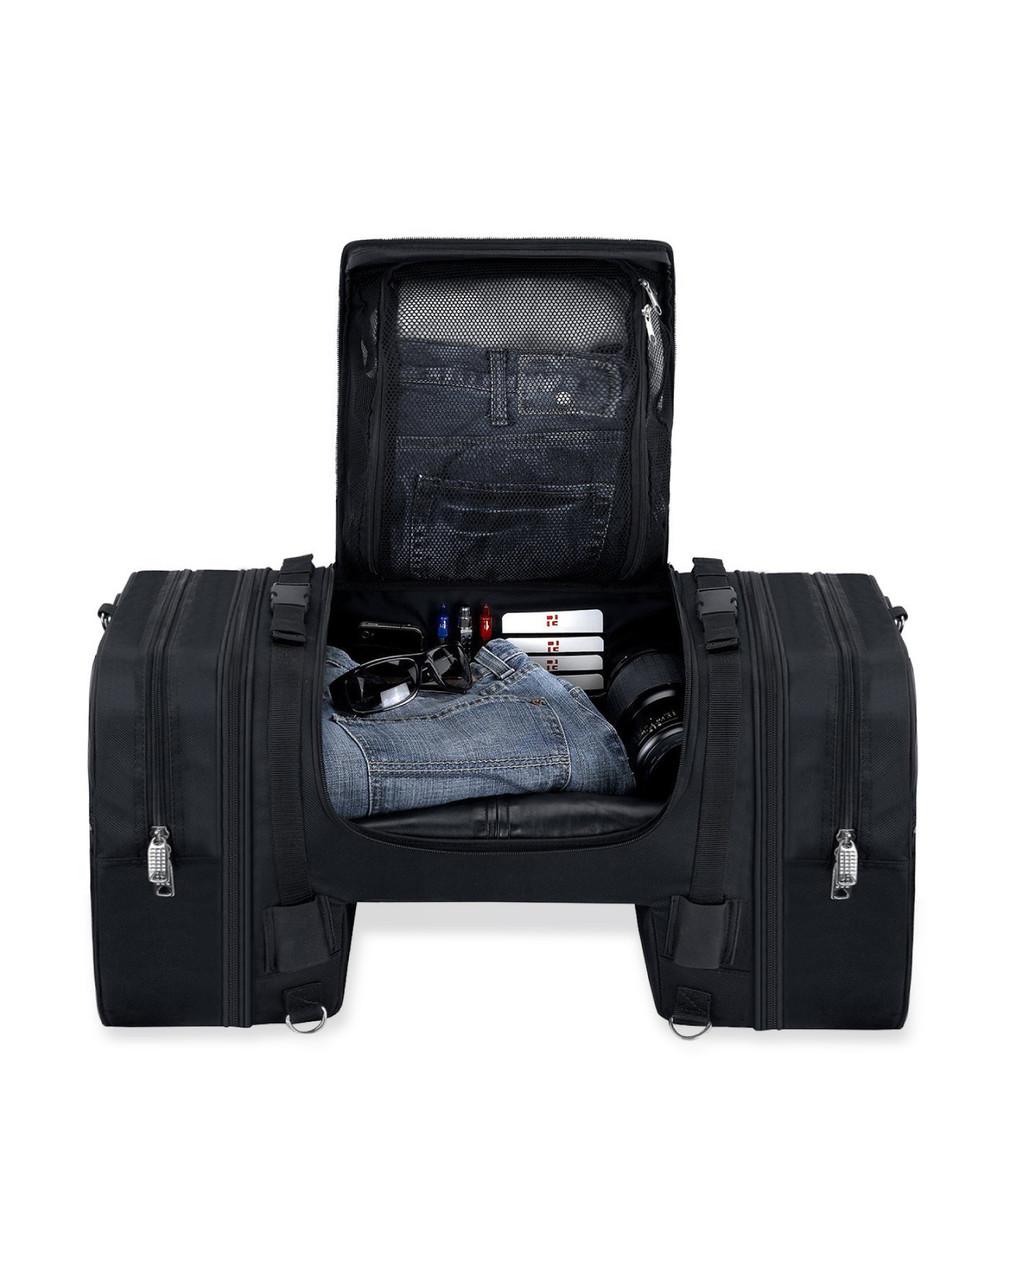 VikingBags Expandable Cruiser Large Motorcycle Sissy Bar Bag Storage